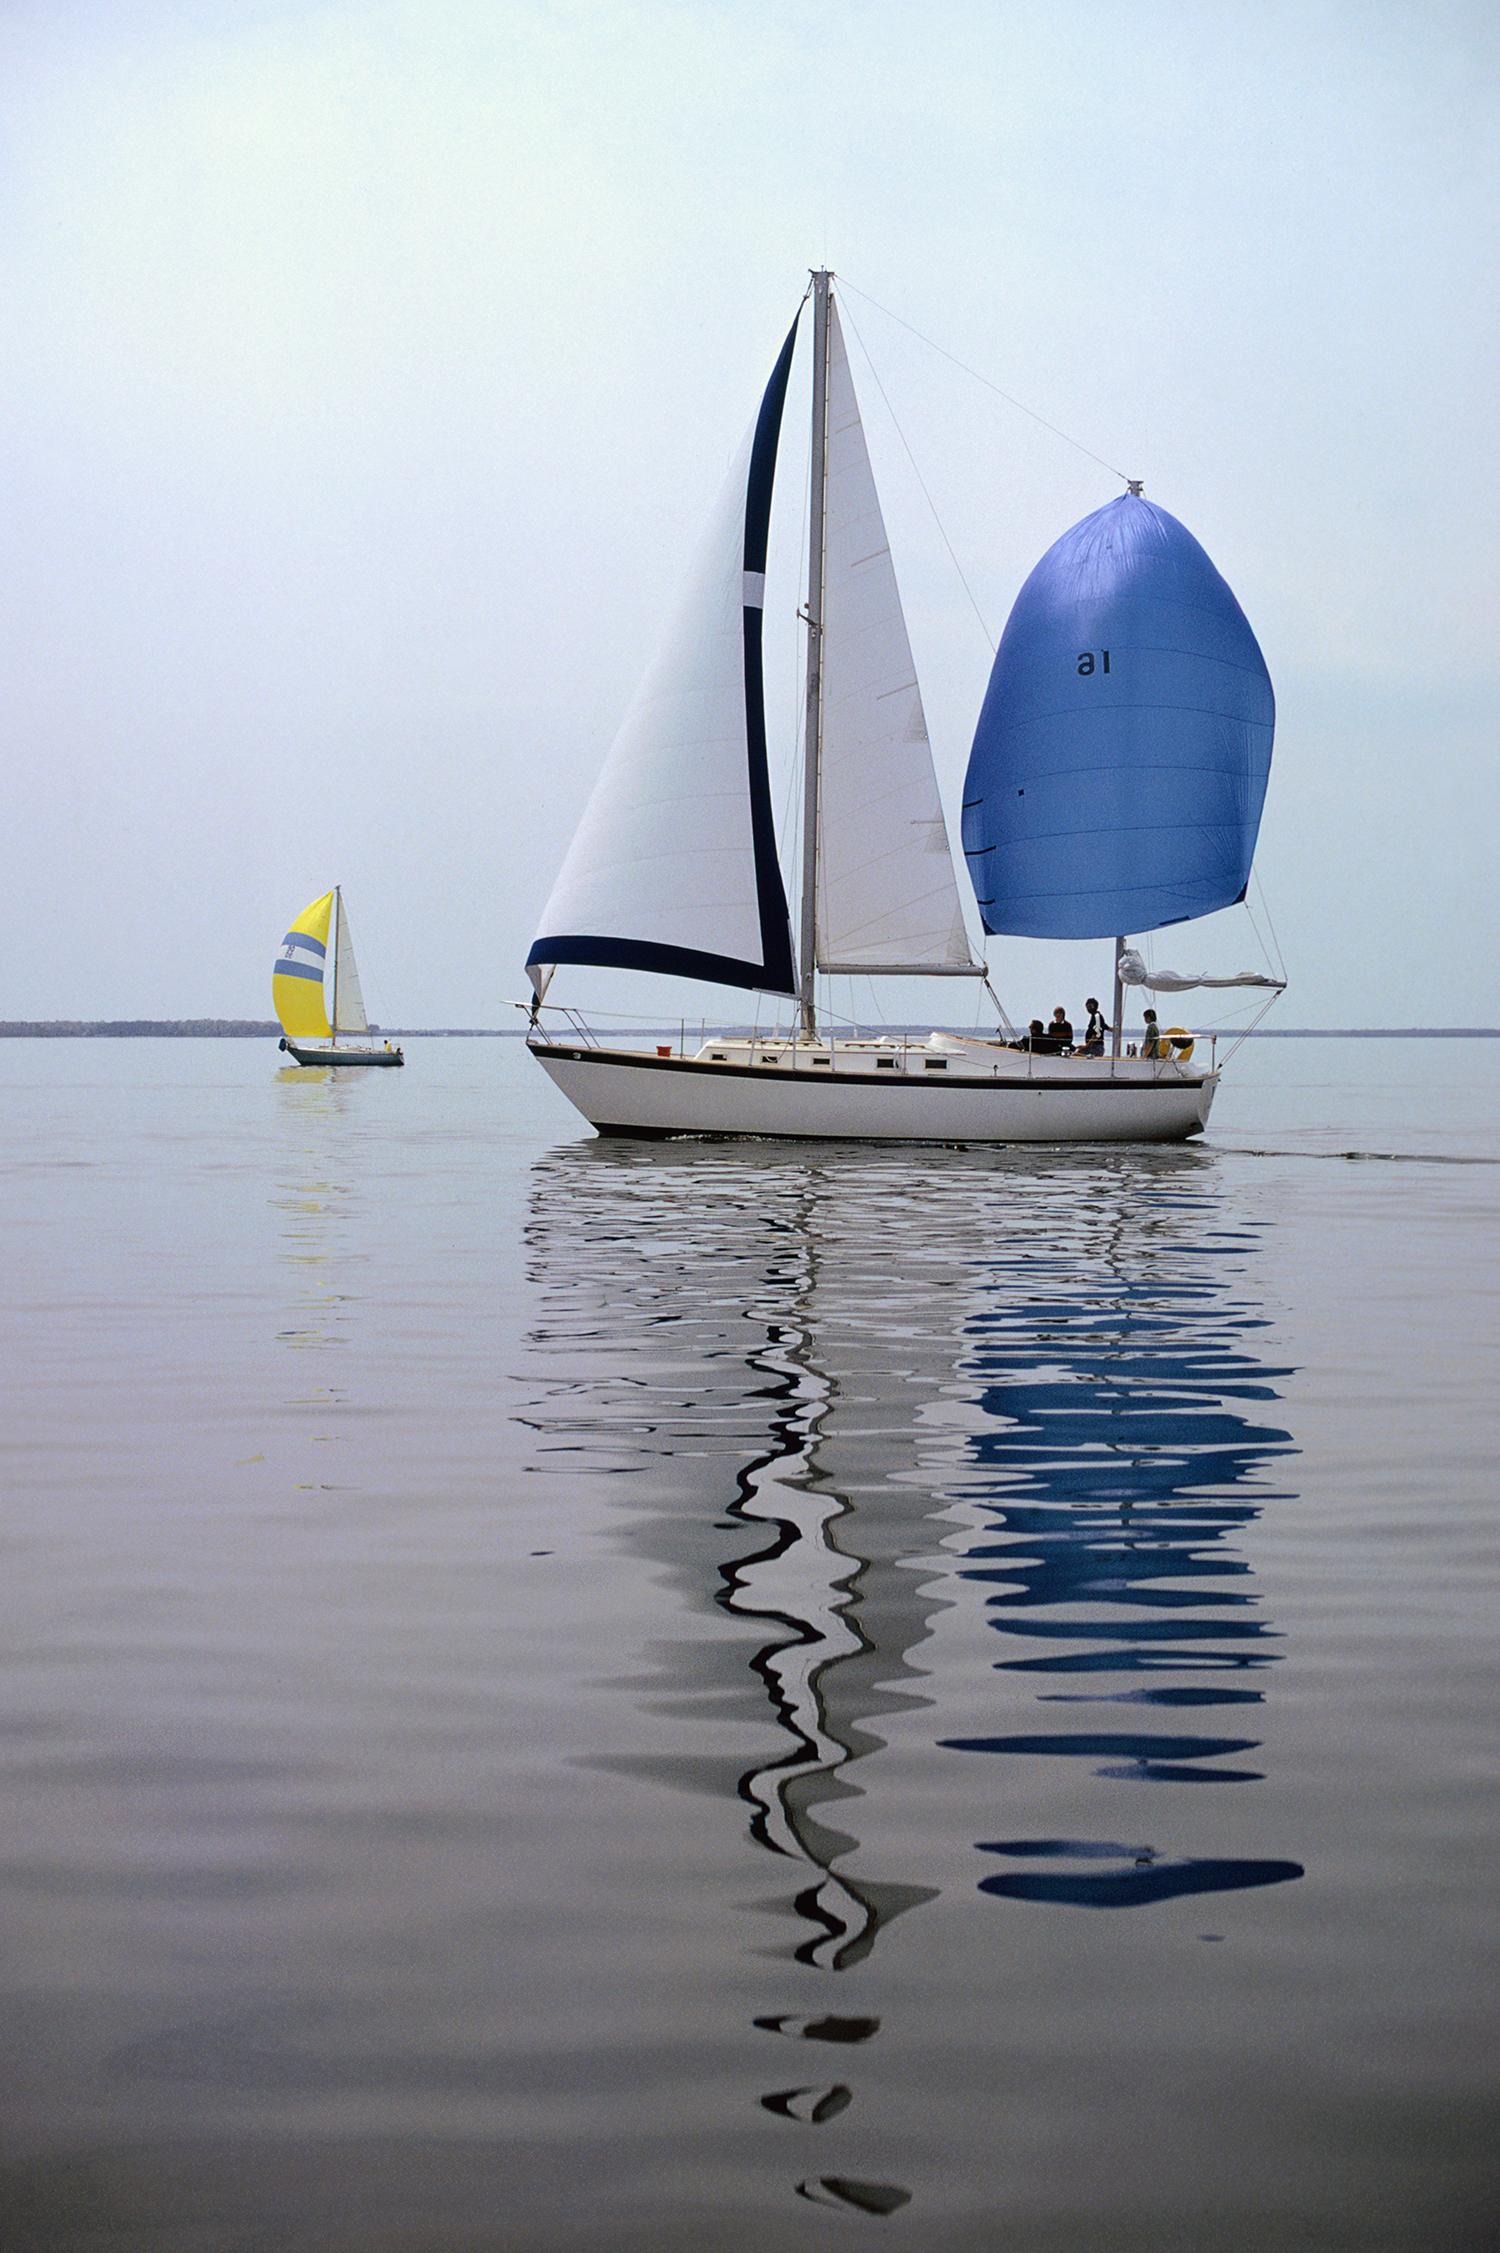 Light Air on the Chesapeake